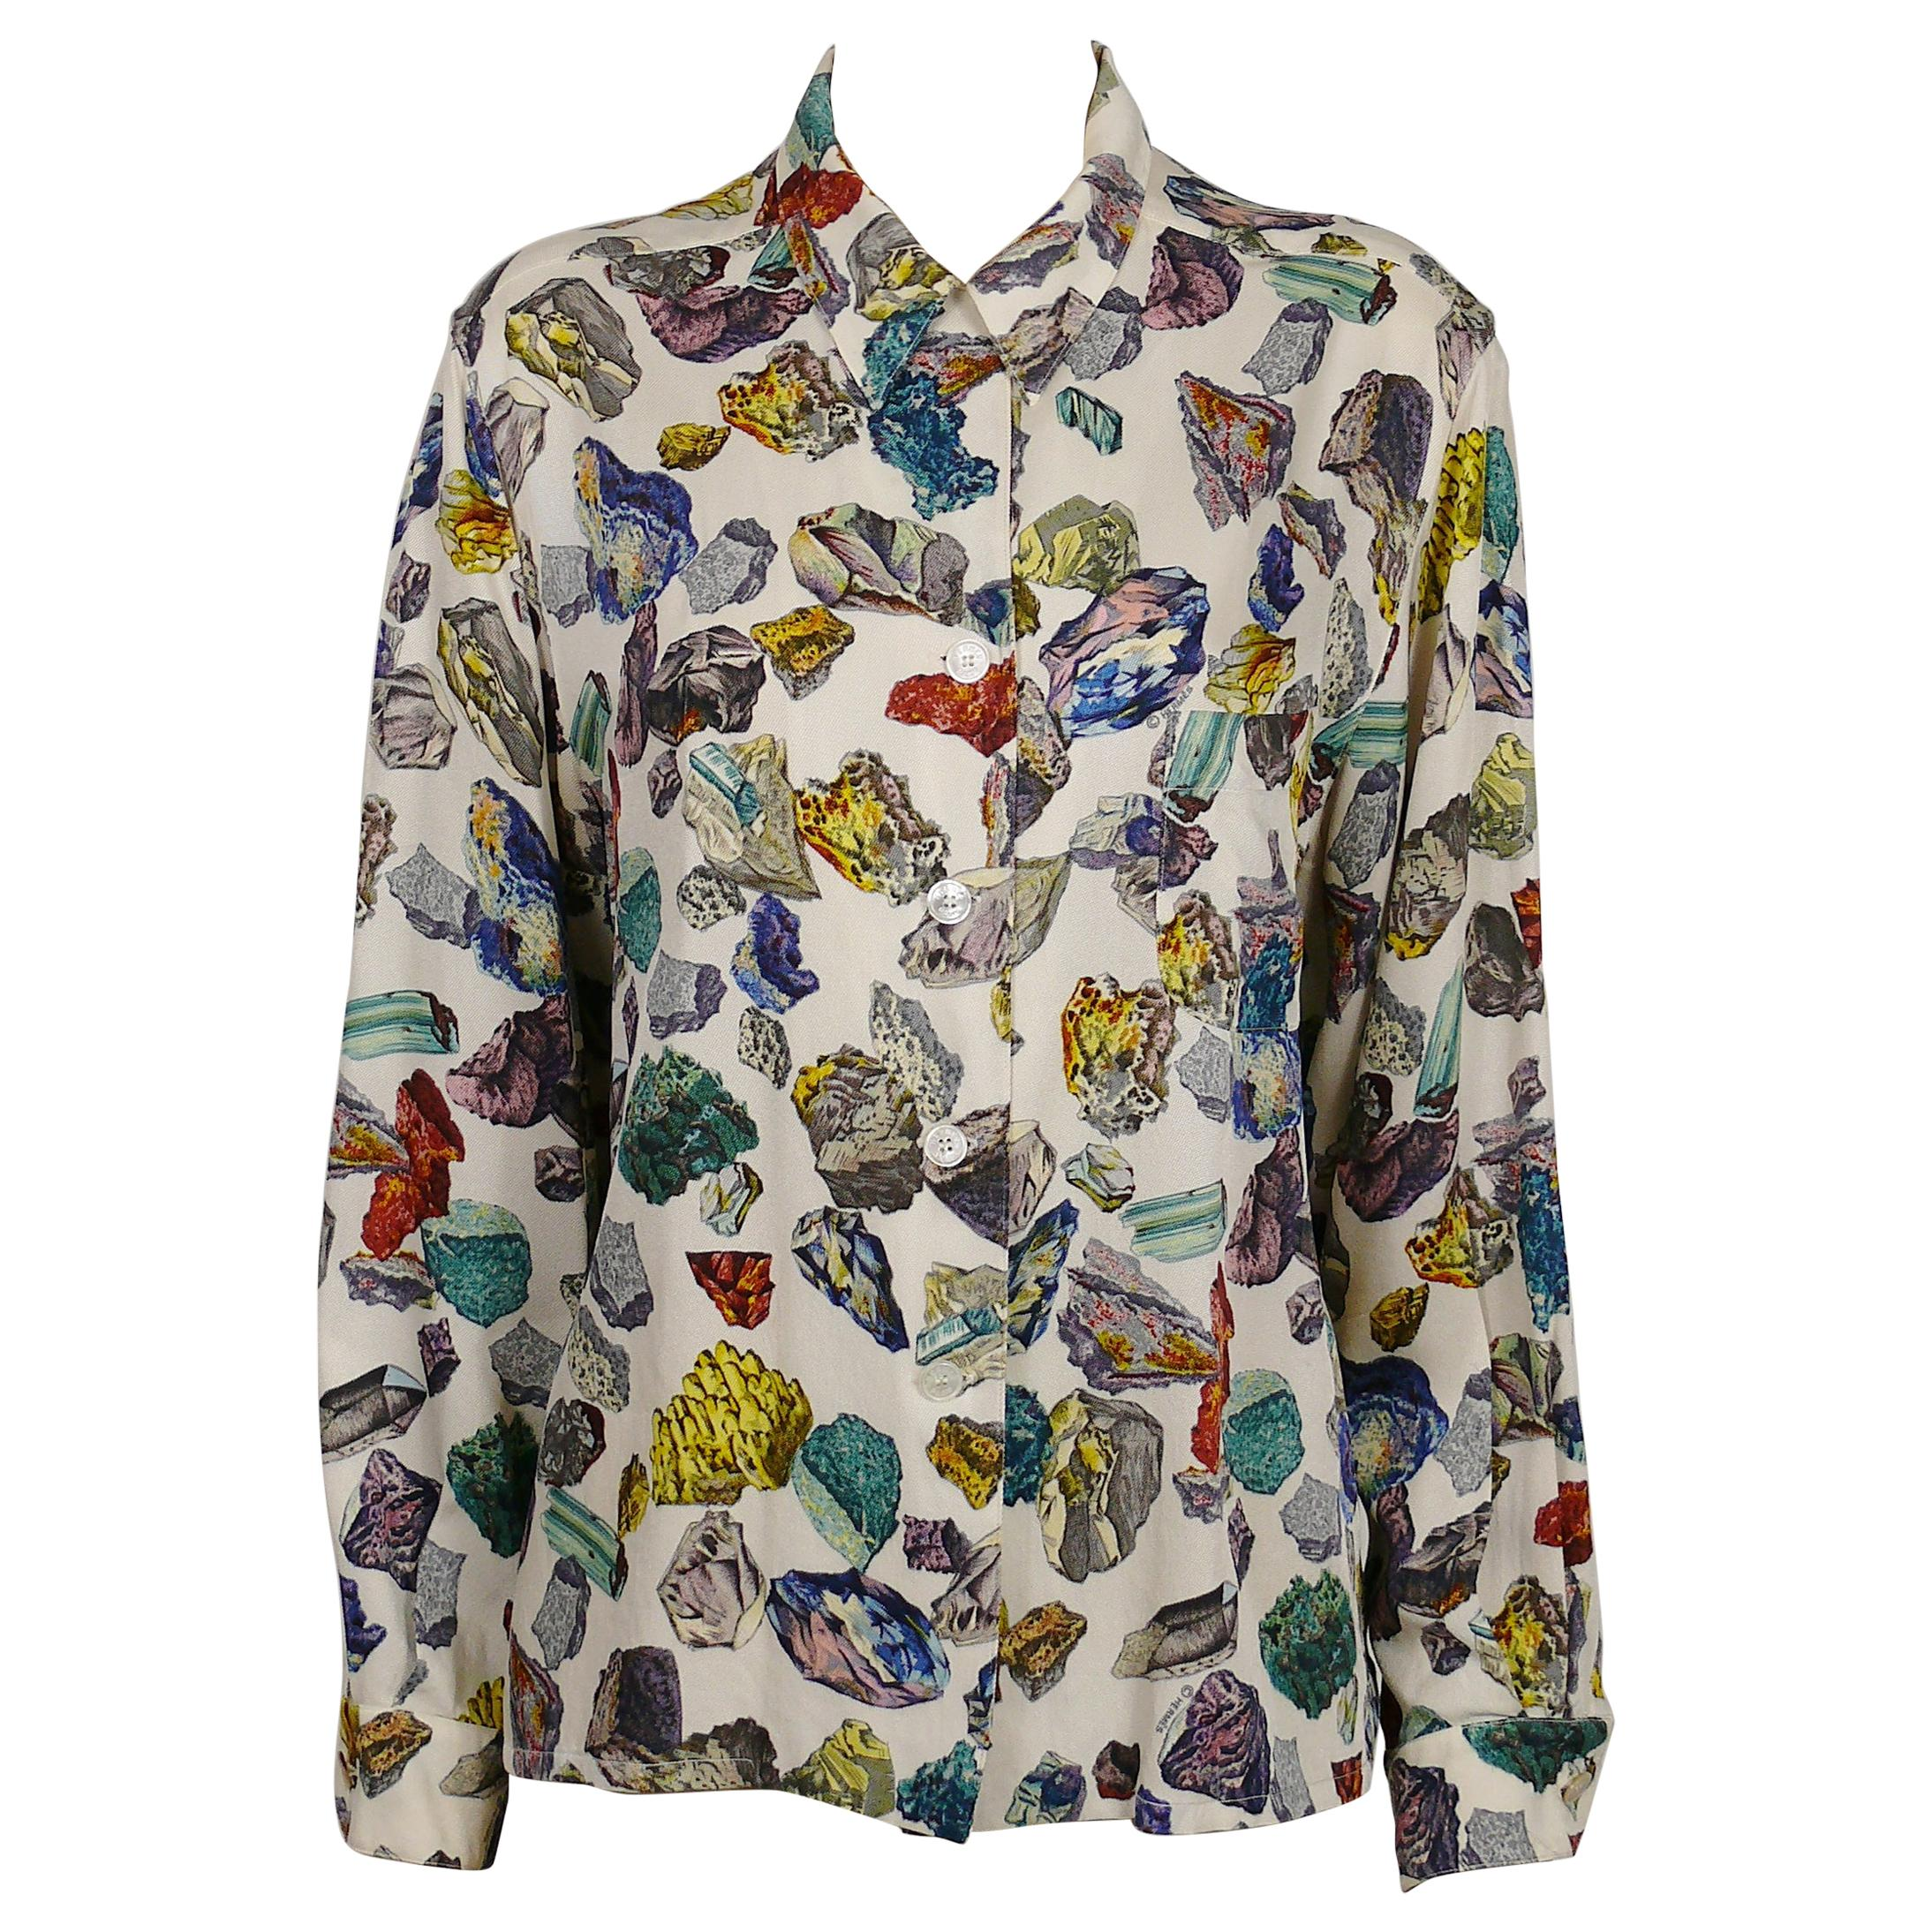 Hermes Vintage Mineraux Silk Shirt Blouse